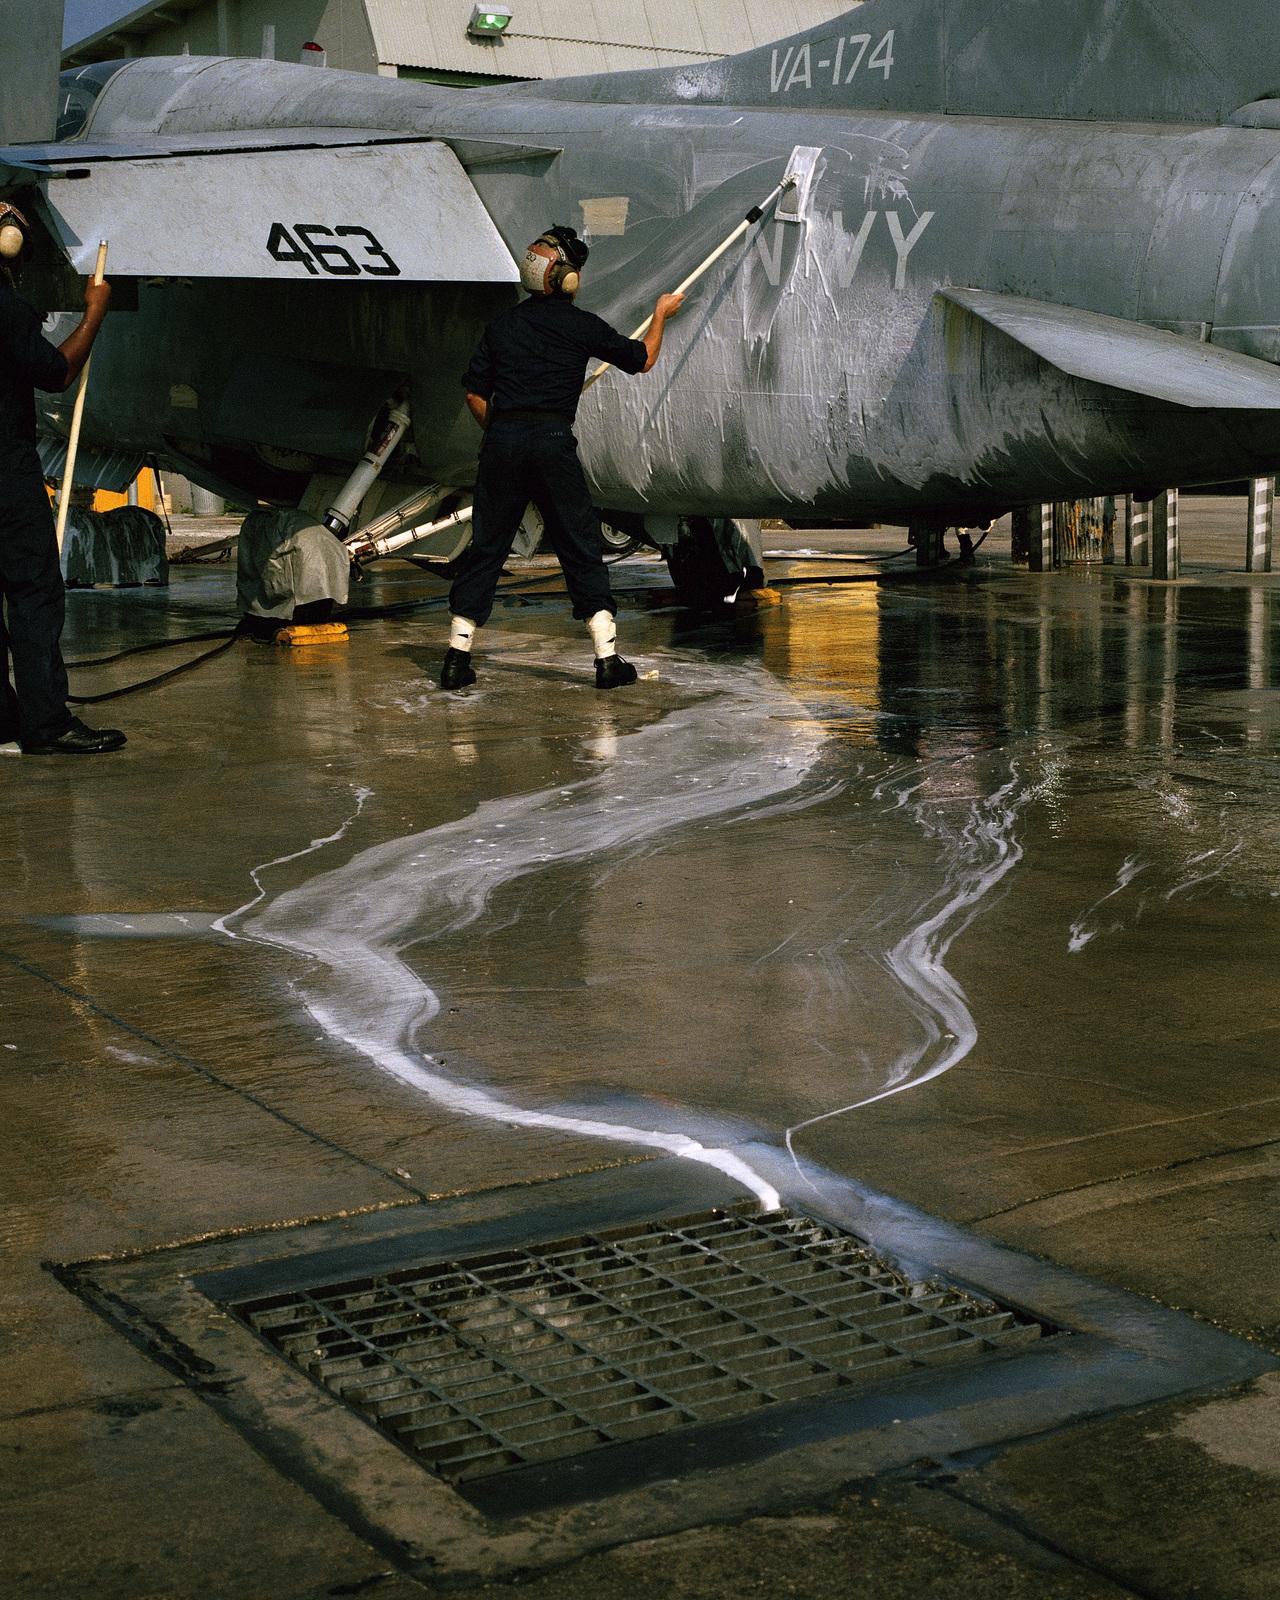 A reservist AIRMAN washes down an Attack Squadron 174 (VA-174) A-7 Corsair II aircraft during his drill weekend at Cecil Field